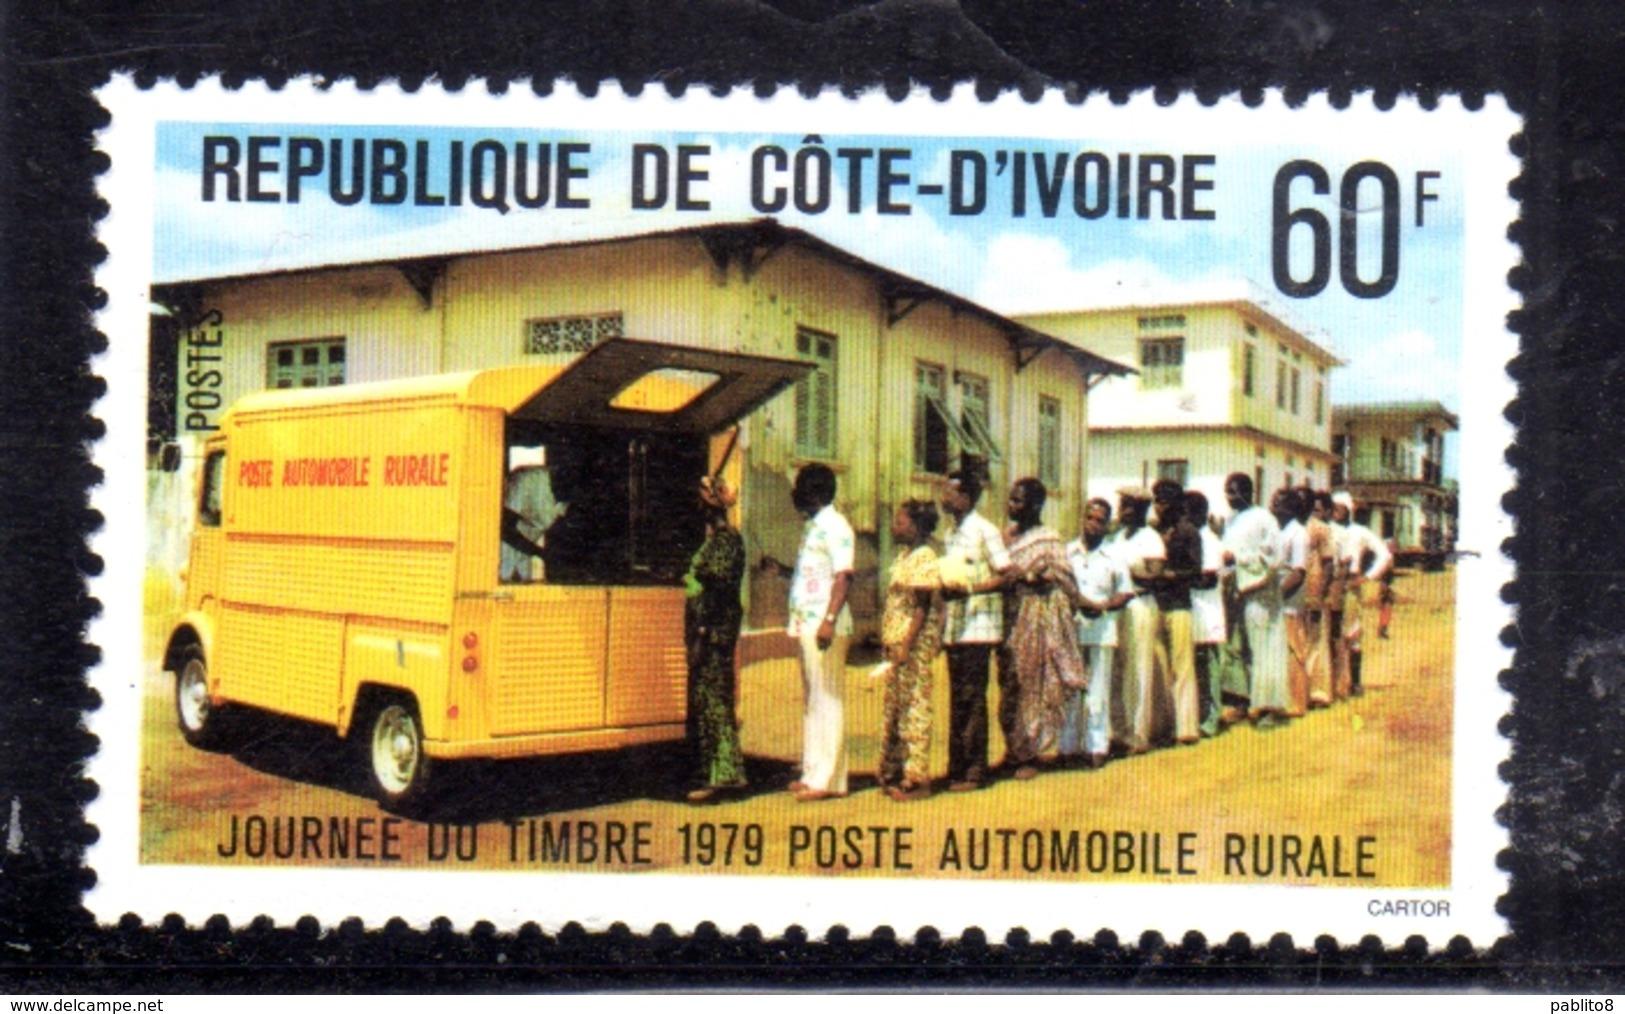 IVORY COAST COSTA D'AVORIO COTE D'IVOIRE 1979 STAMP DAY JOURNEE DU TIMBRE POSTE AUTOMOBILE RURALE 60f MNH - Costa D'Avorio (1960-...)